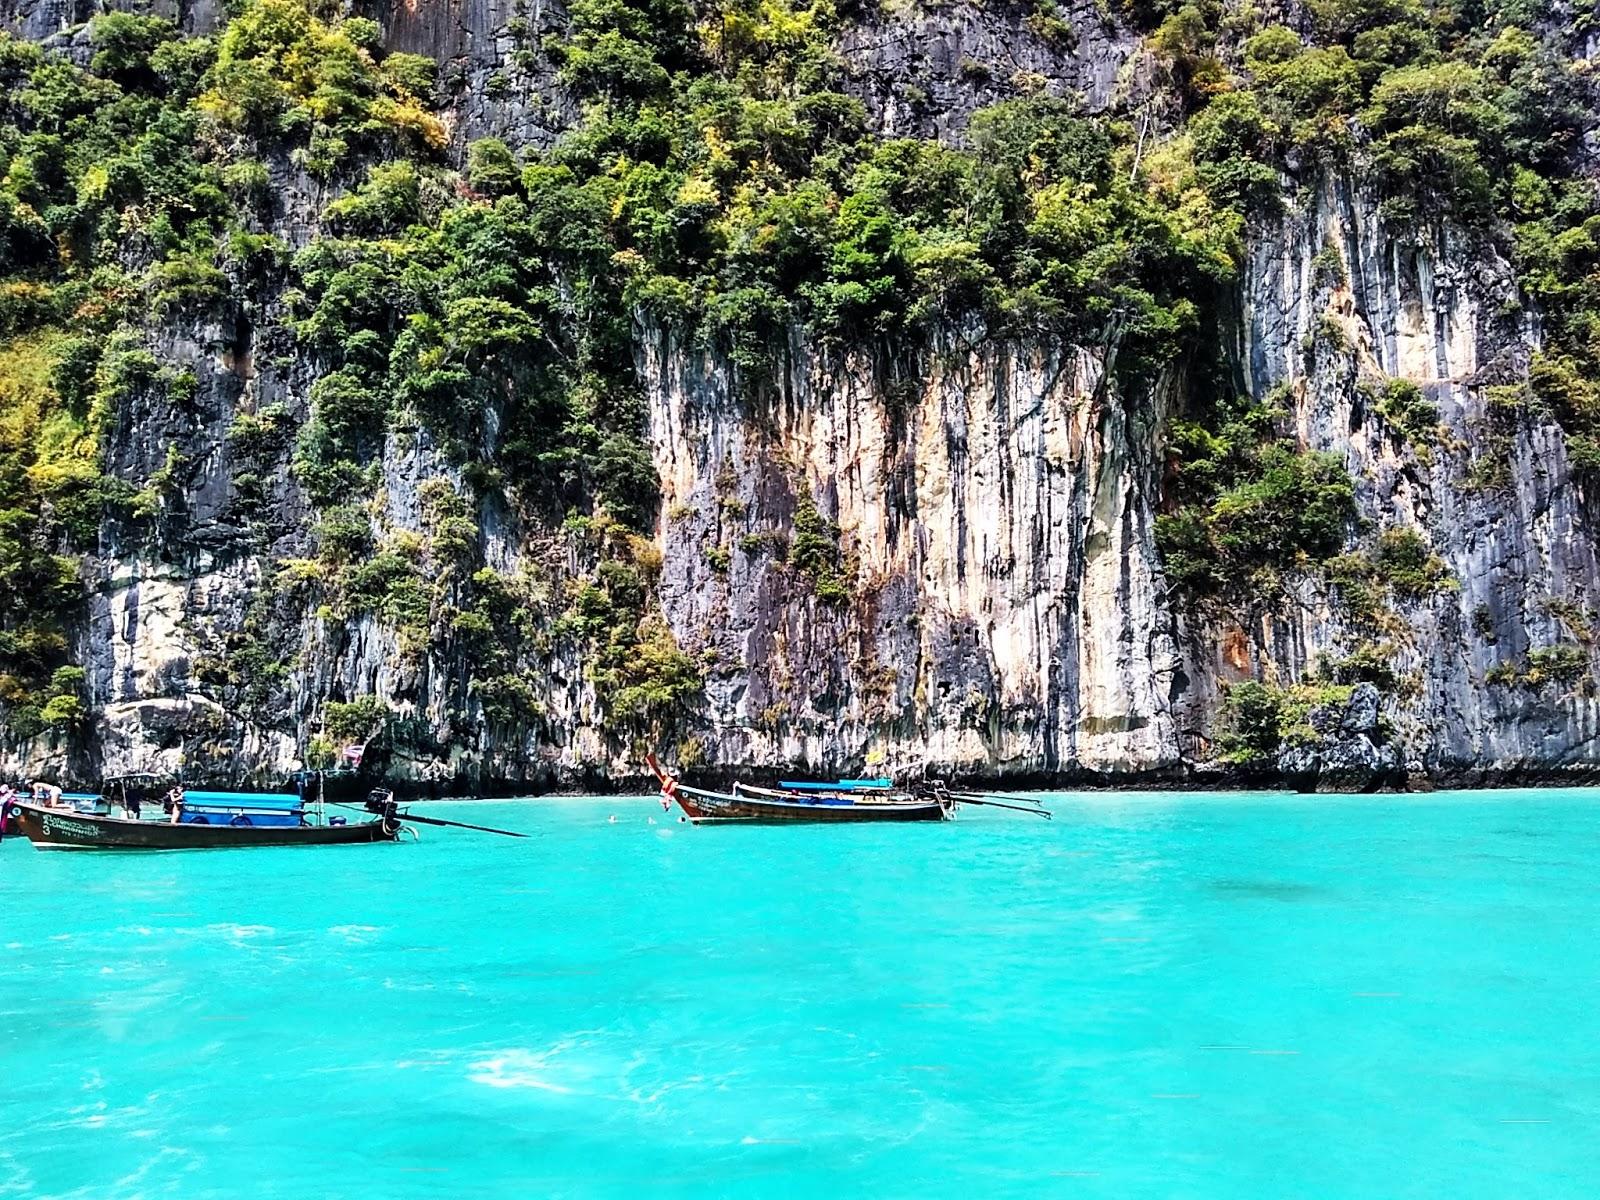 Tailandia Hong Island sem filtro azul